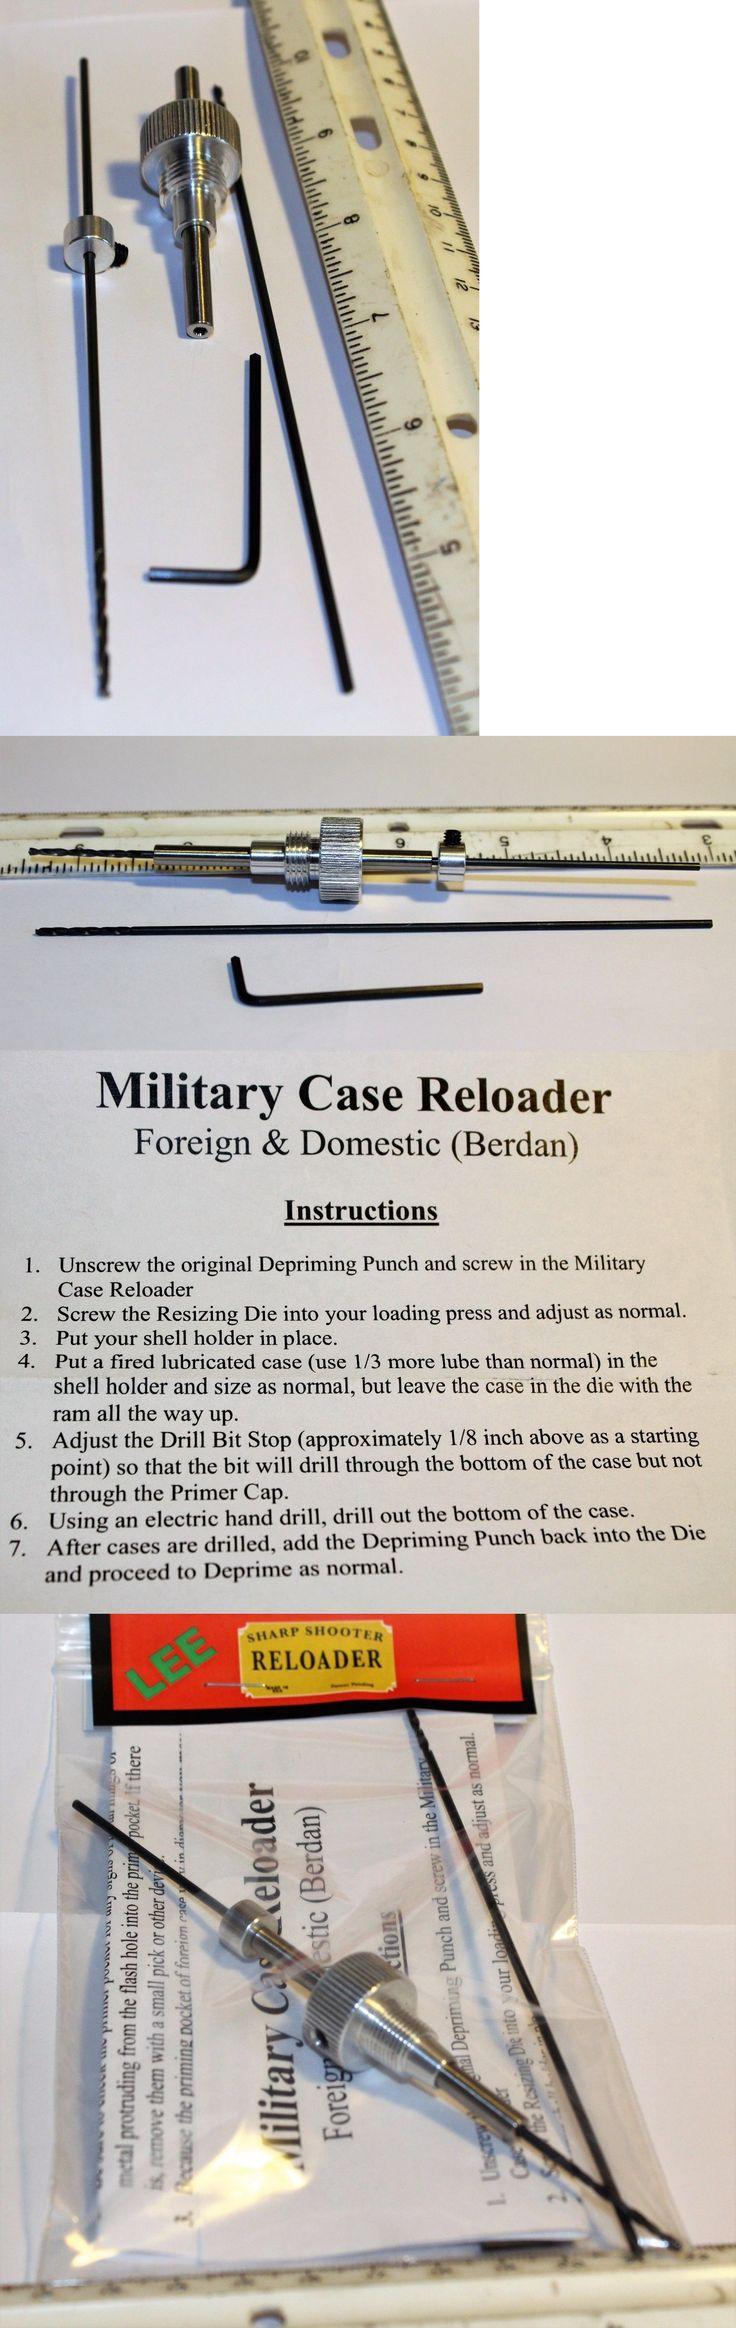 Other Hunting Reloading Equip 7308: Lyman Berdan Case Reloader Brass Steel Lyman Rcbs Lee Redding Hornad -> BUY IT NOW ONLY: $42.75 on eBay!